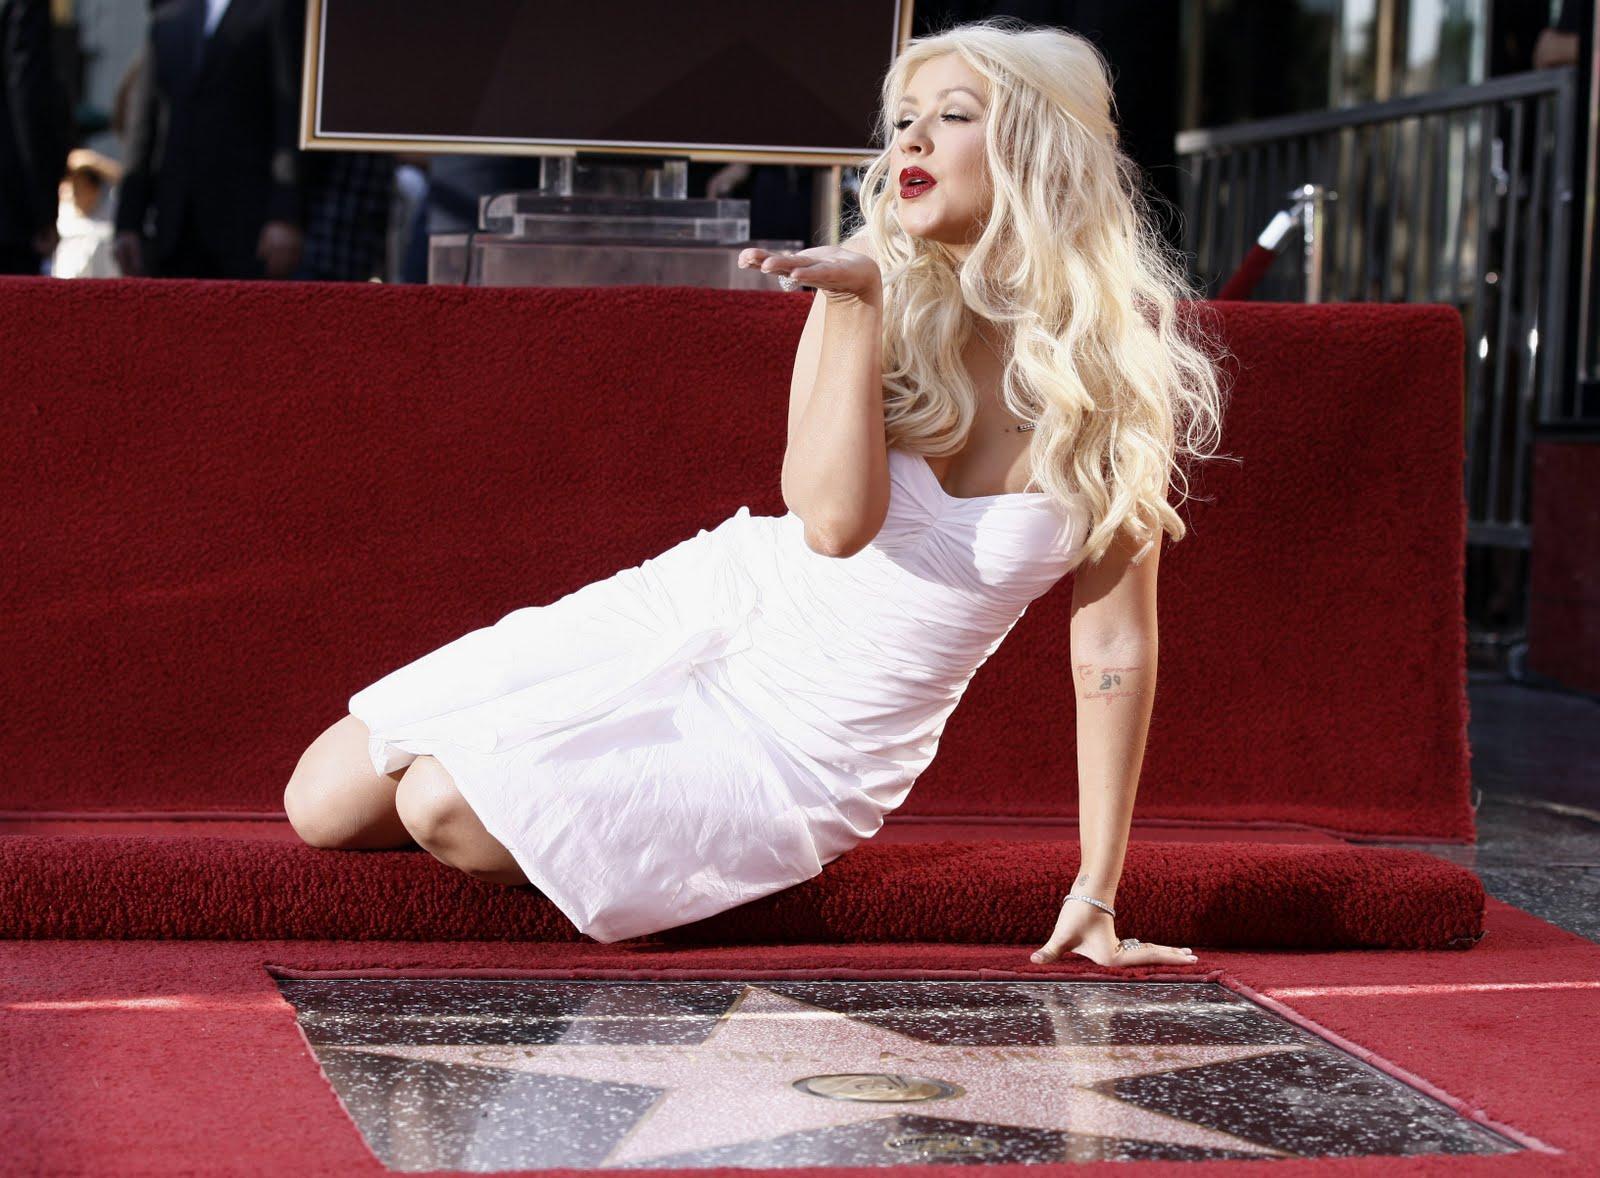 http://2.bp.blogspot.com/_eH2XqieIgMY/TOGpbNrSgJI/AAAAAAAAC4U/InQtYzs5tQI/s1600/55493_Celebutopia_ChristinaAguileraishonoredwithastaronTheHollywoodWalkOfFame_03_122_339lo.jpg